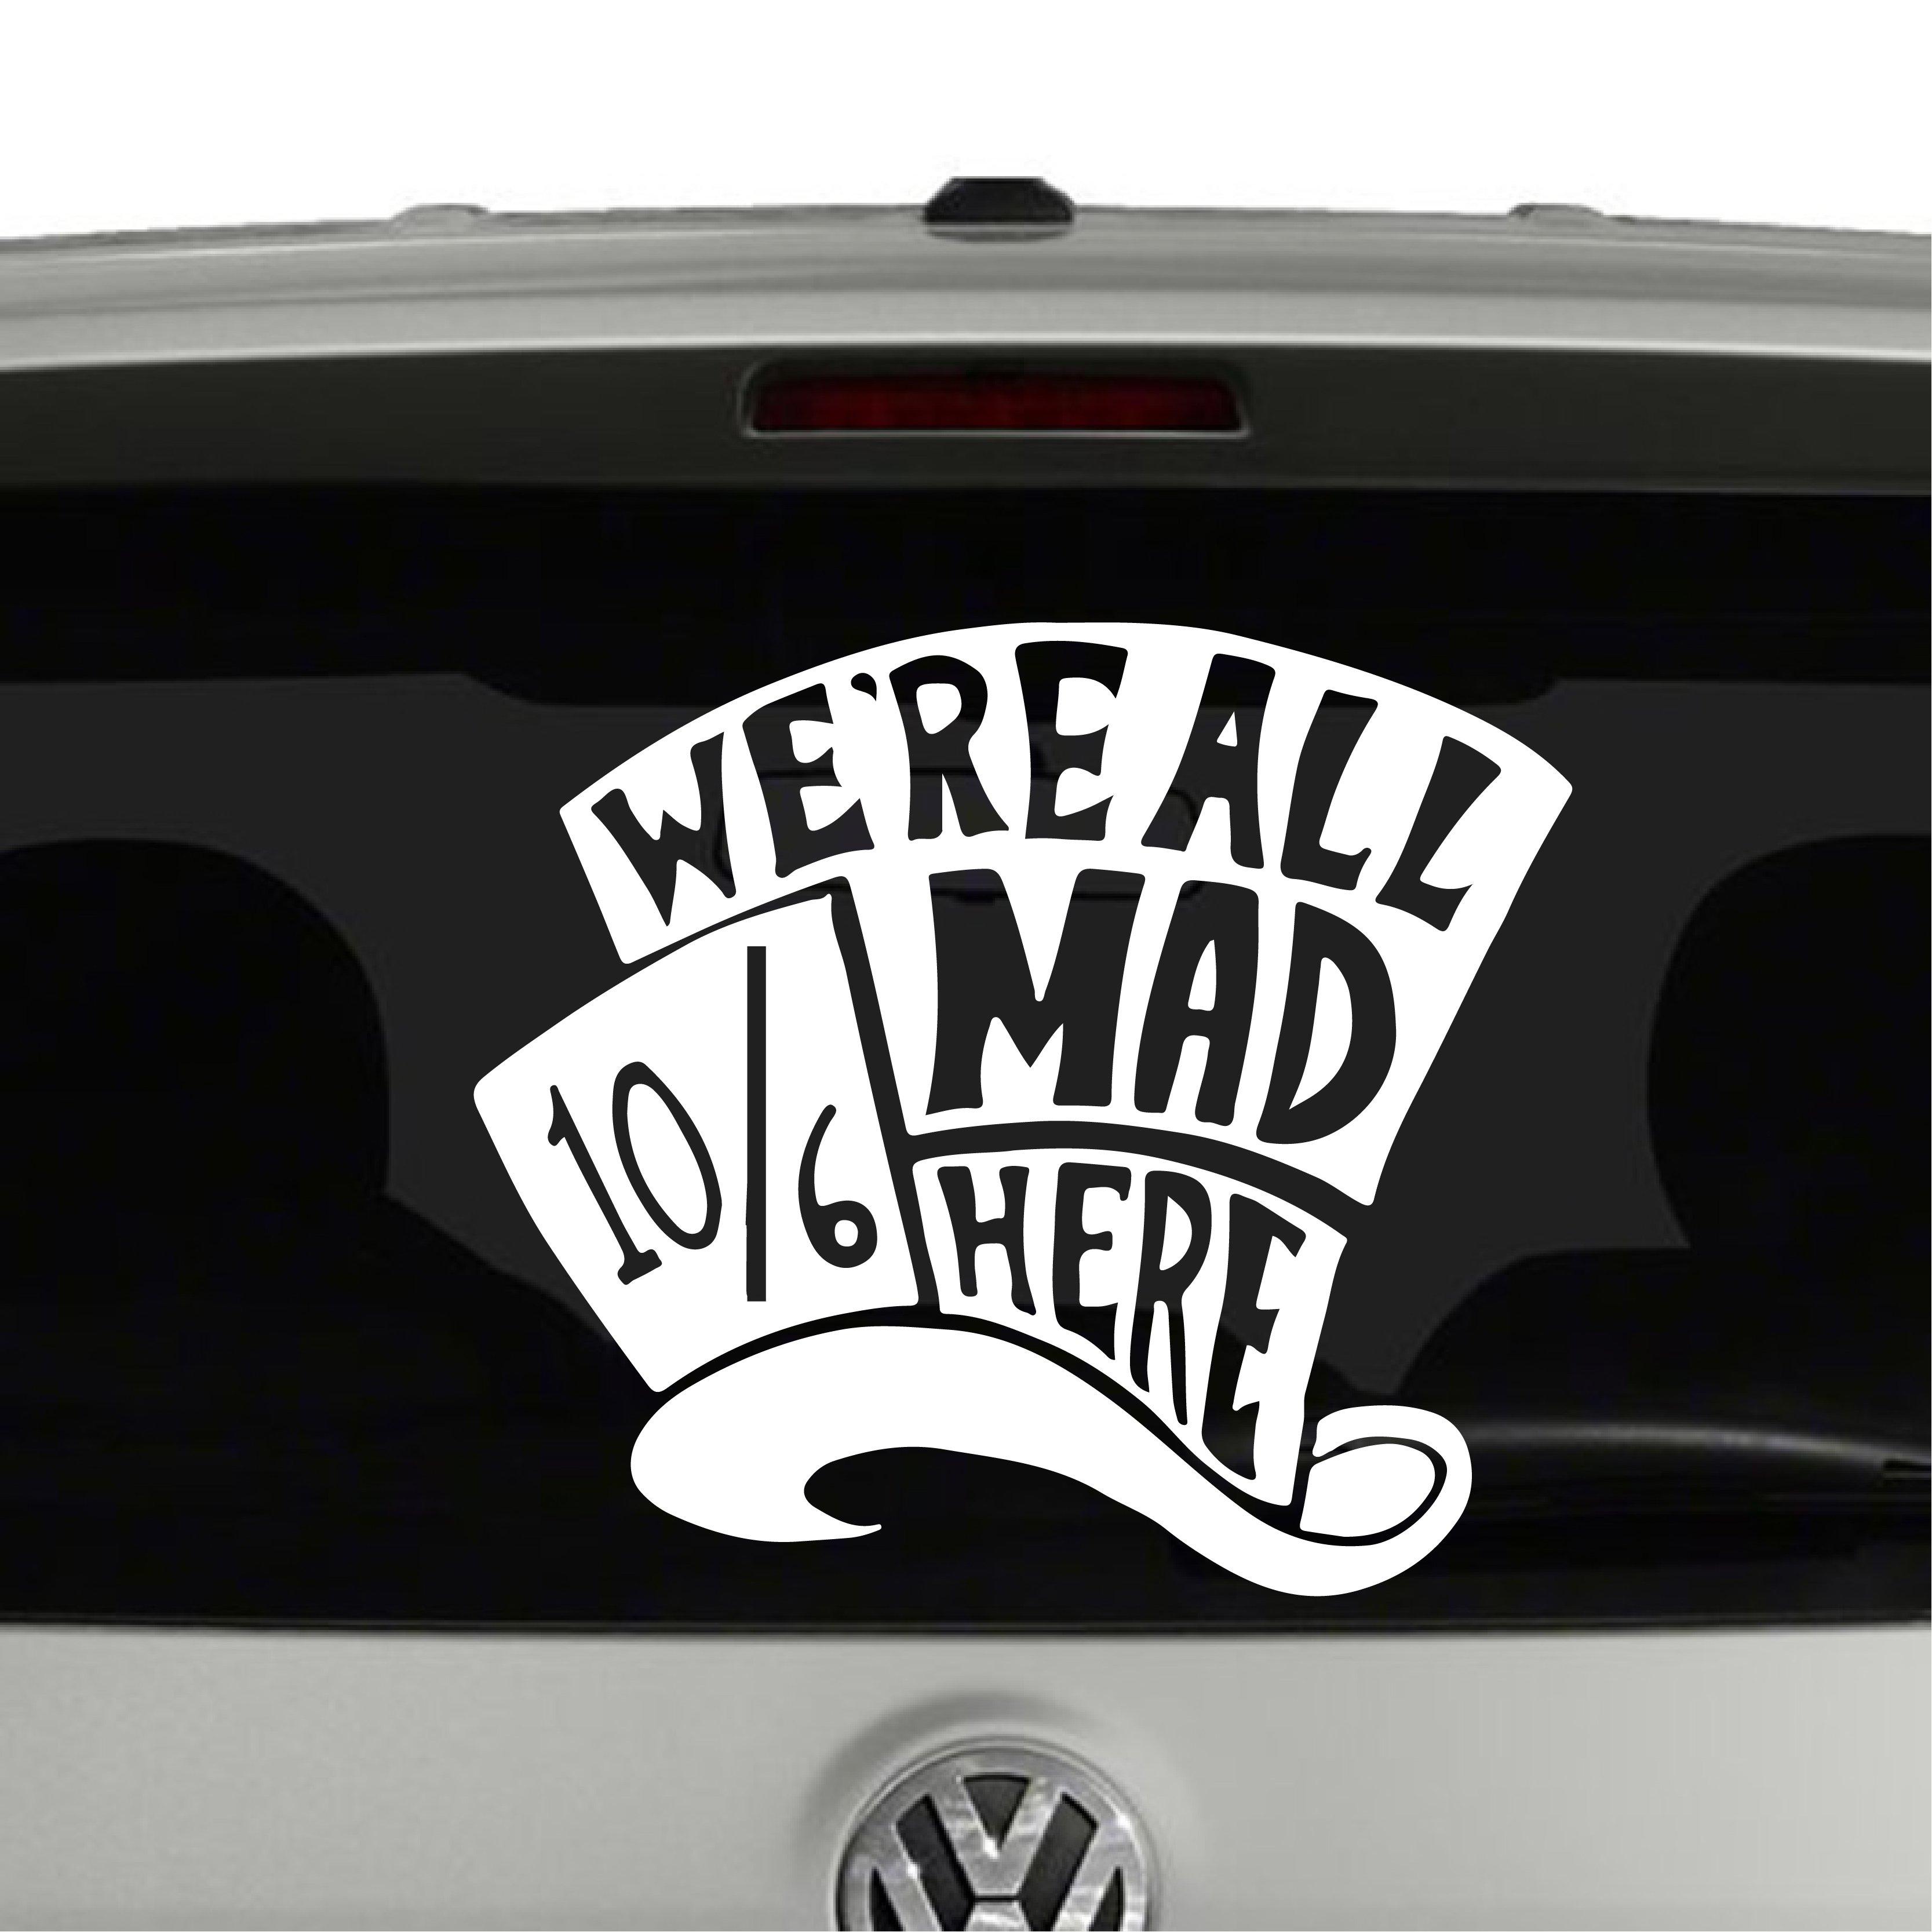 Mad hatter were all mad here alice in wonderland inspired vinyl decal sticker